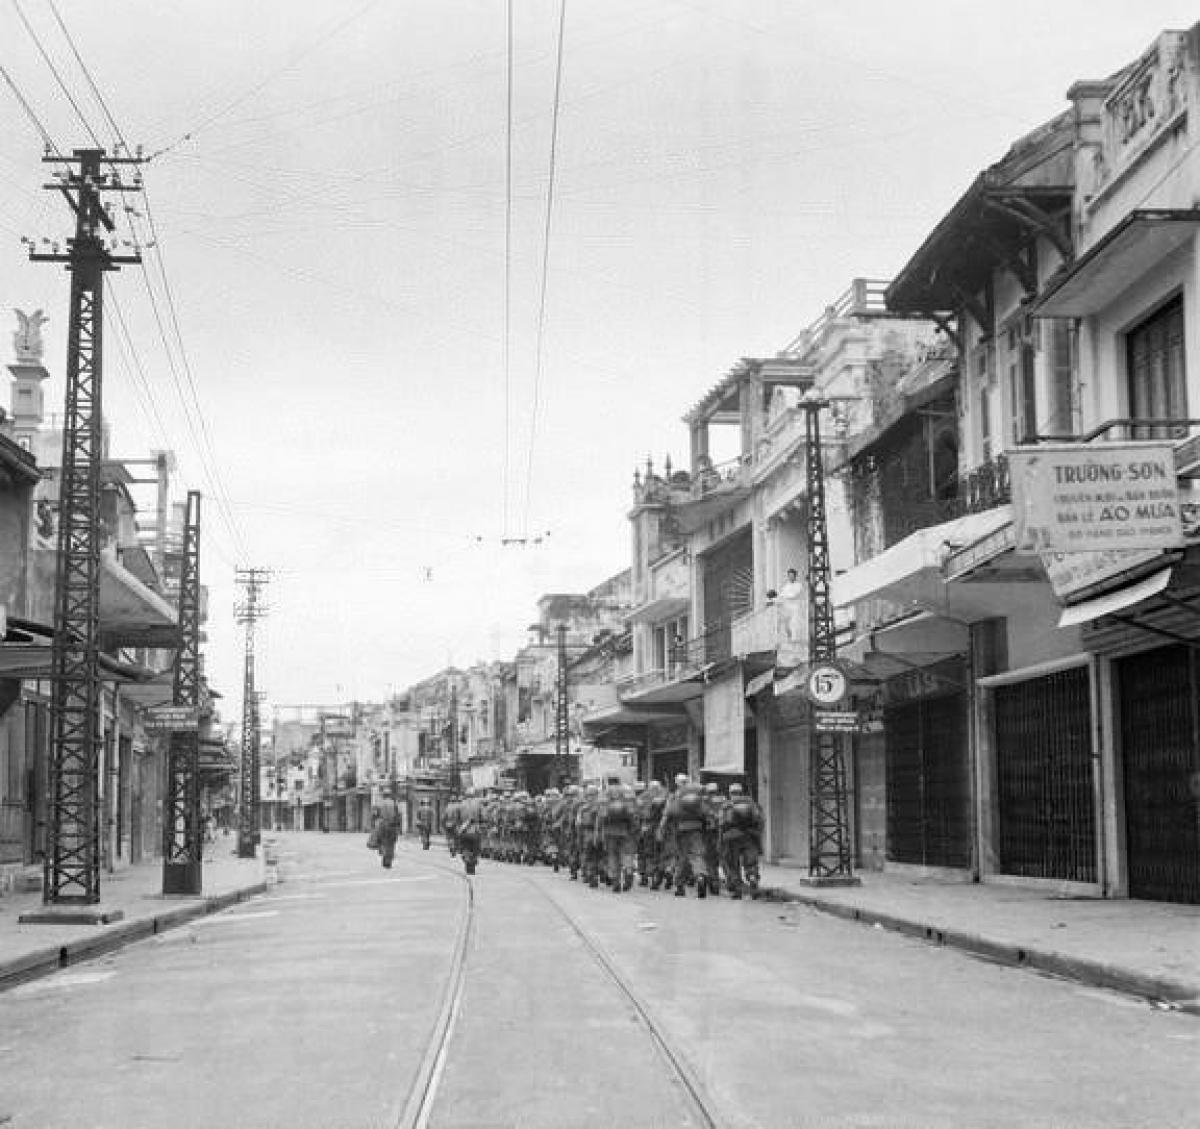 As French troops depart Hanoi, they head towards Long Bien bridge on October 9, 1954.